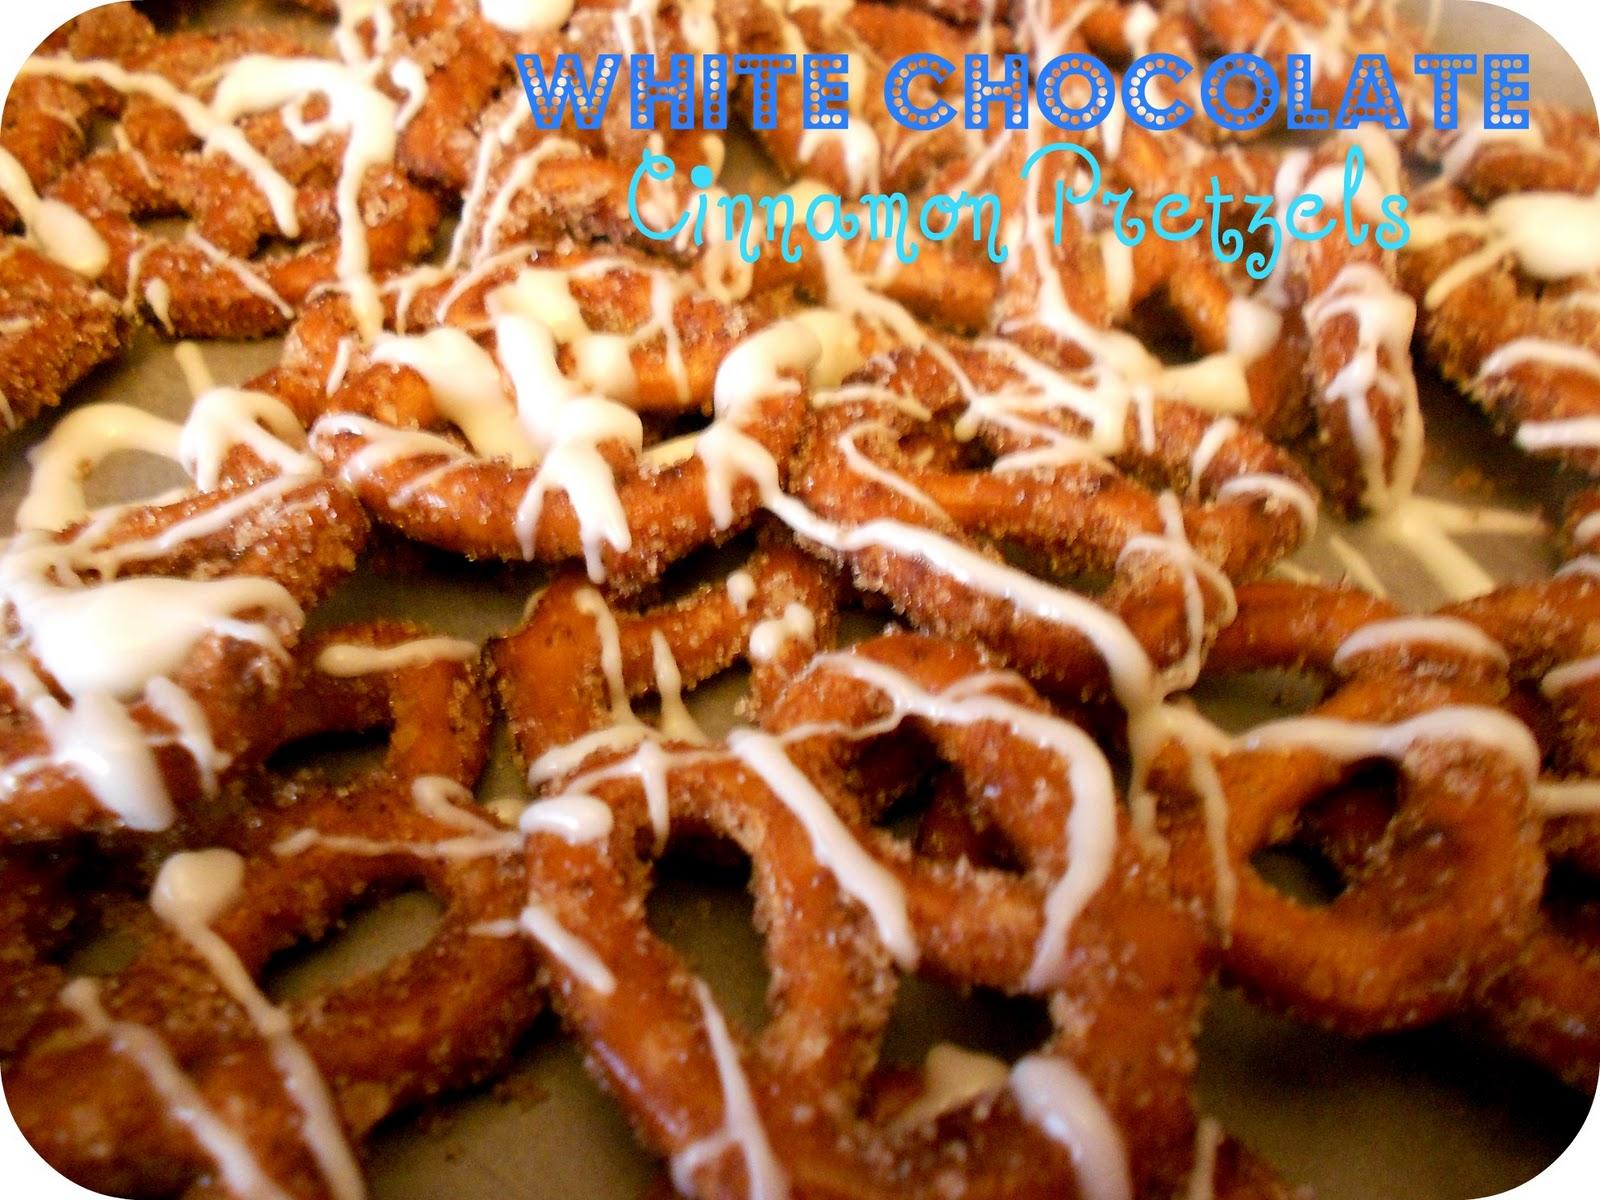 White Chocolate Cinnamon Sugar Pretzels Recipe / Six Sisters' Stuff ...